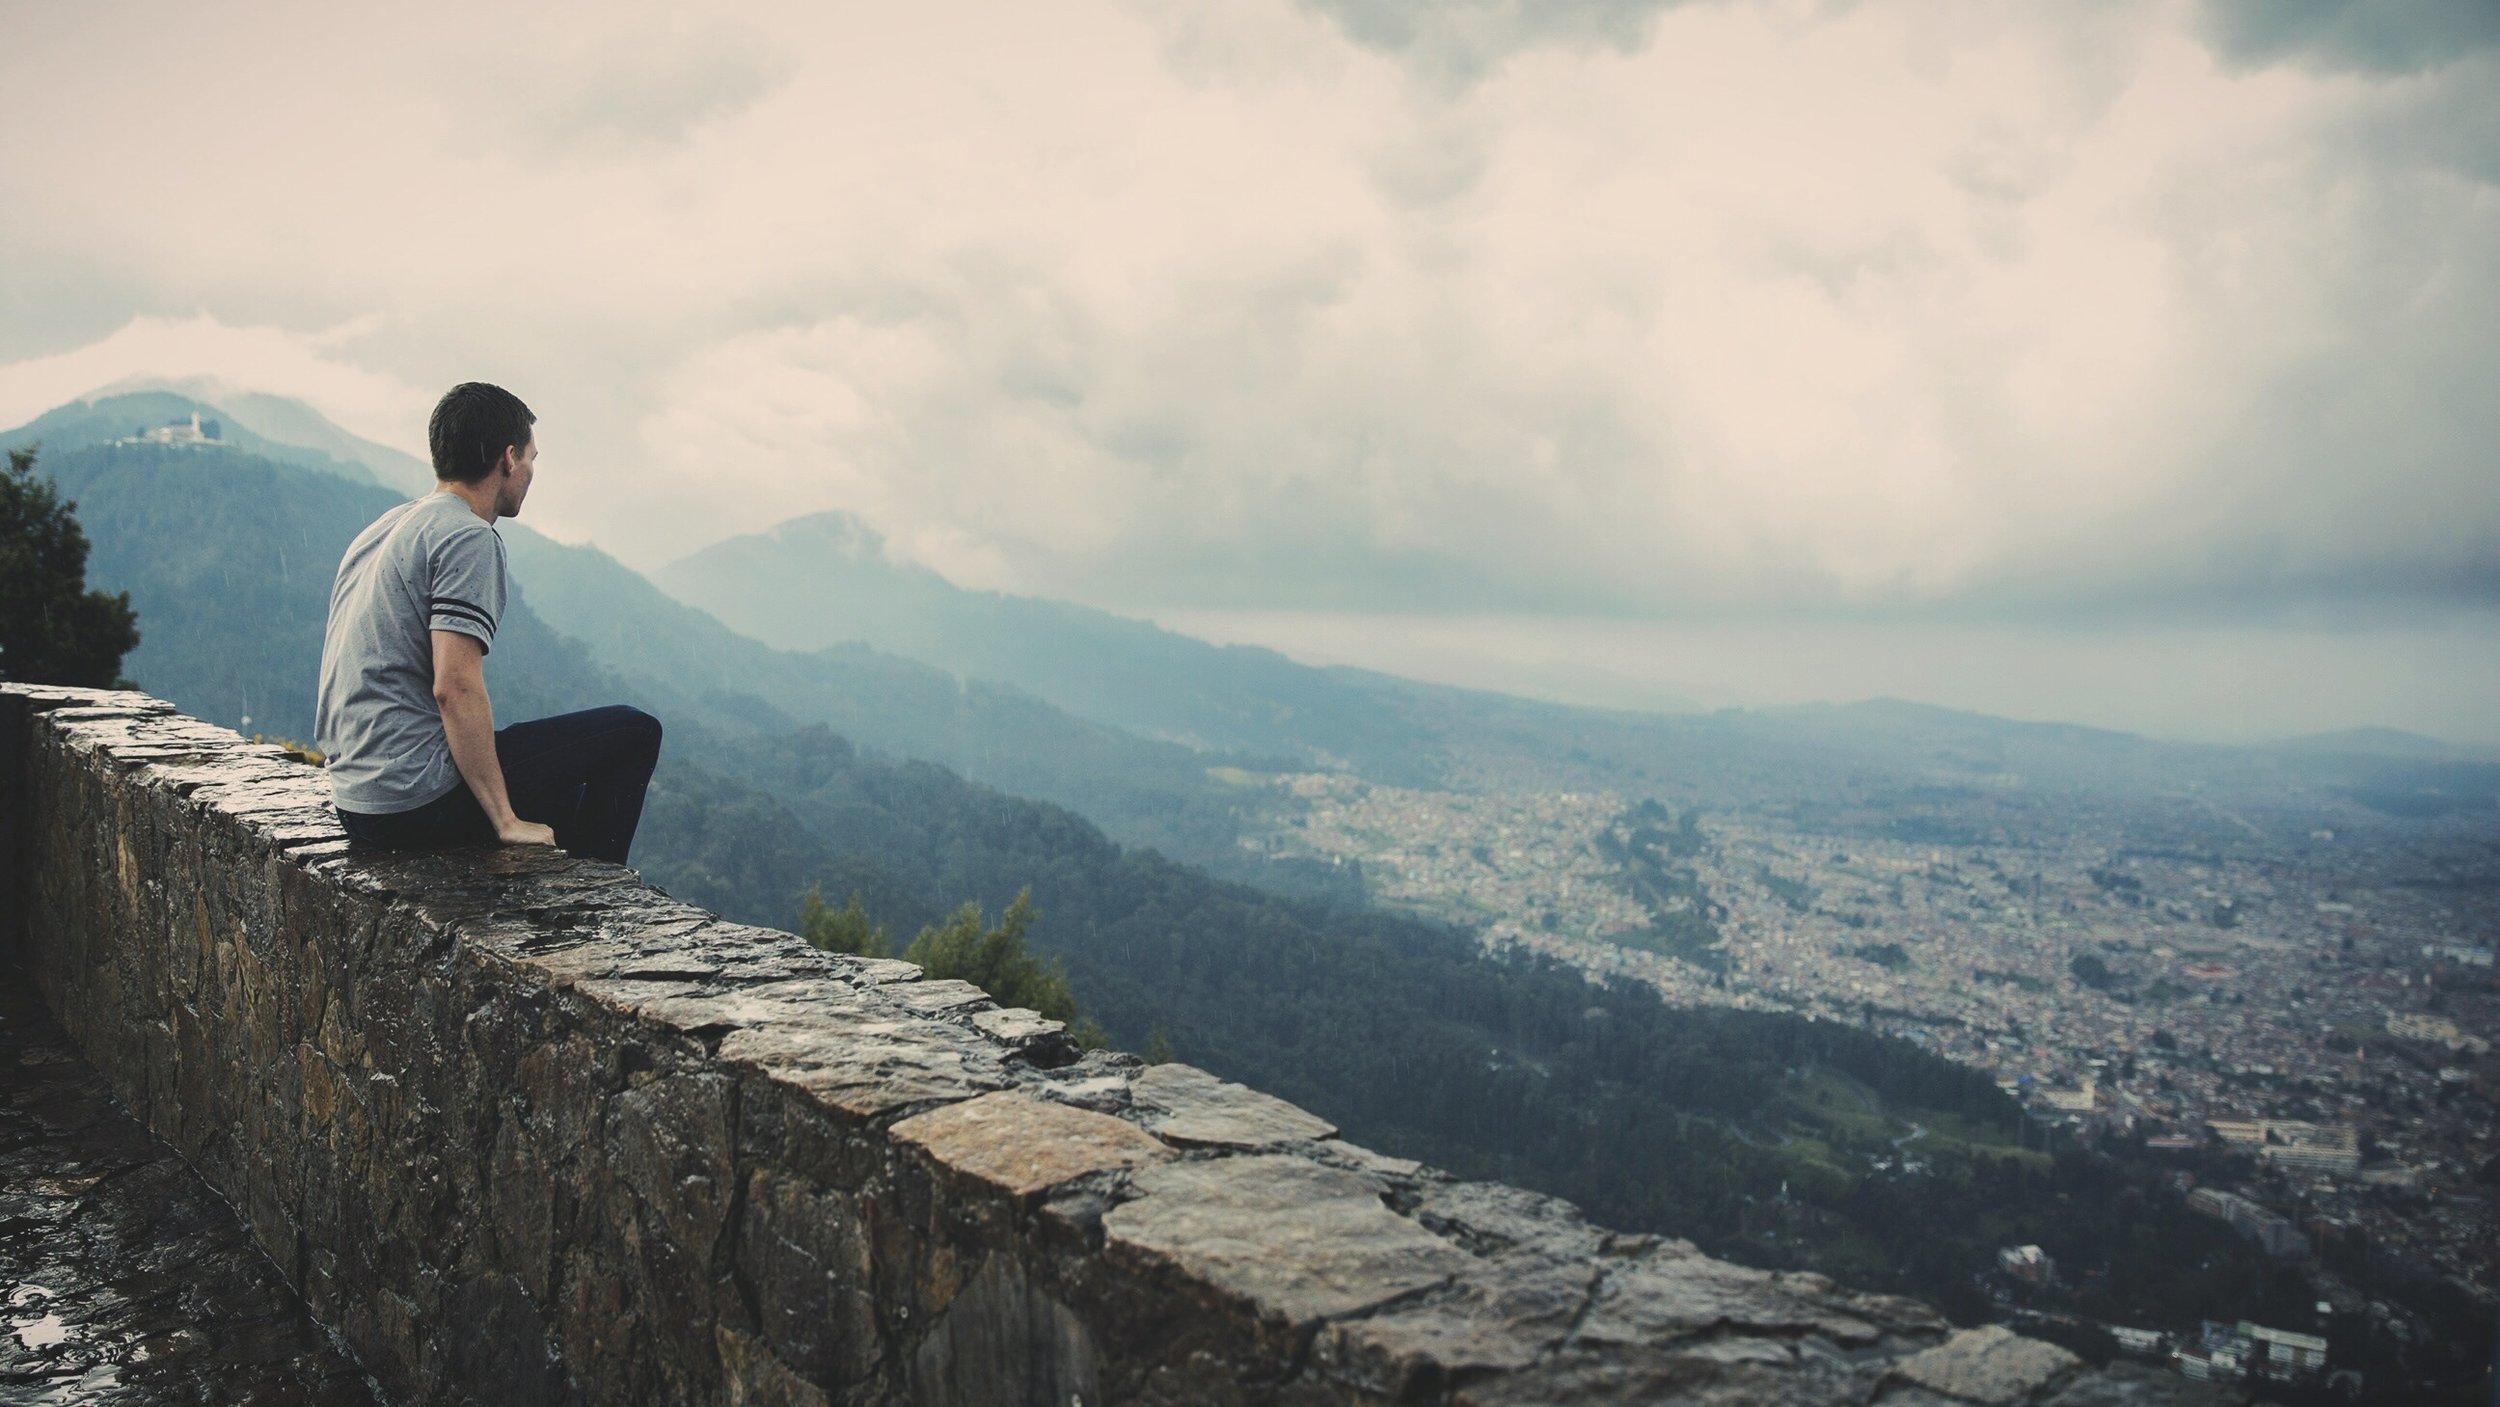 uwm.man-wilderness-walking-person-mountain-cloud-3896-pxhere.com